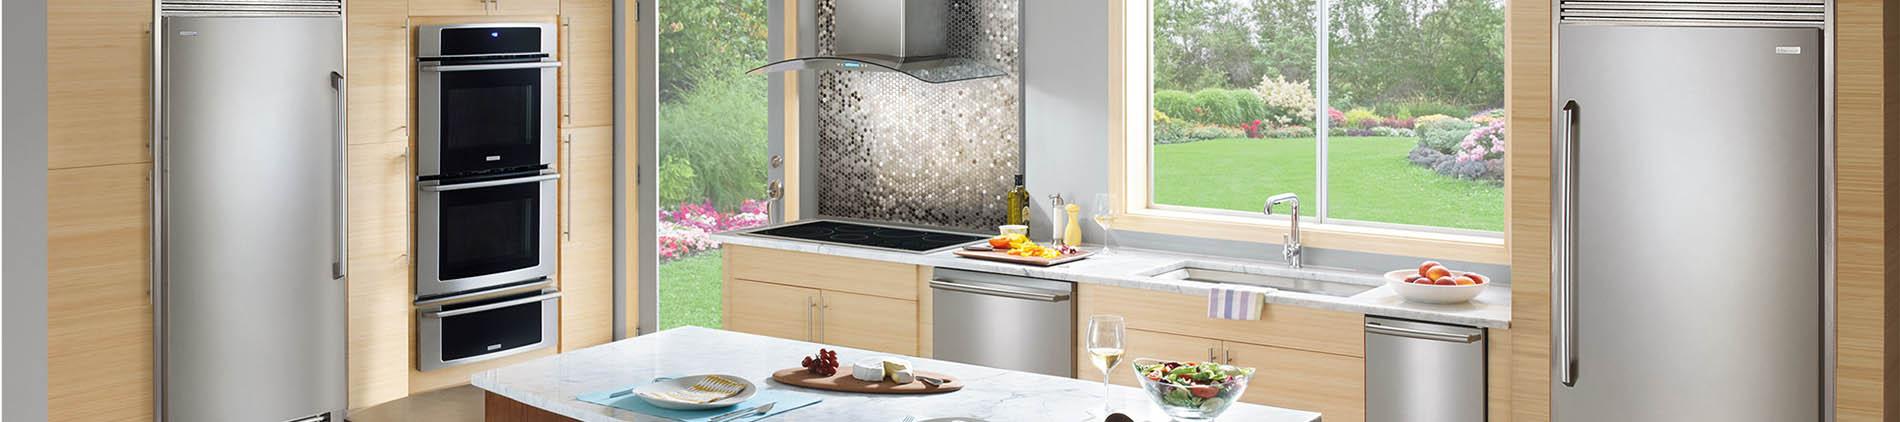 Bamboo, Kitchen, Twin, Fridge, Frigidaire, Wall Oven, Cooktop, Dishwasher